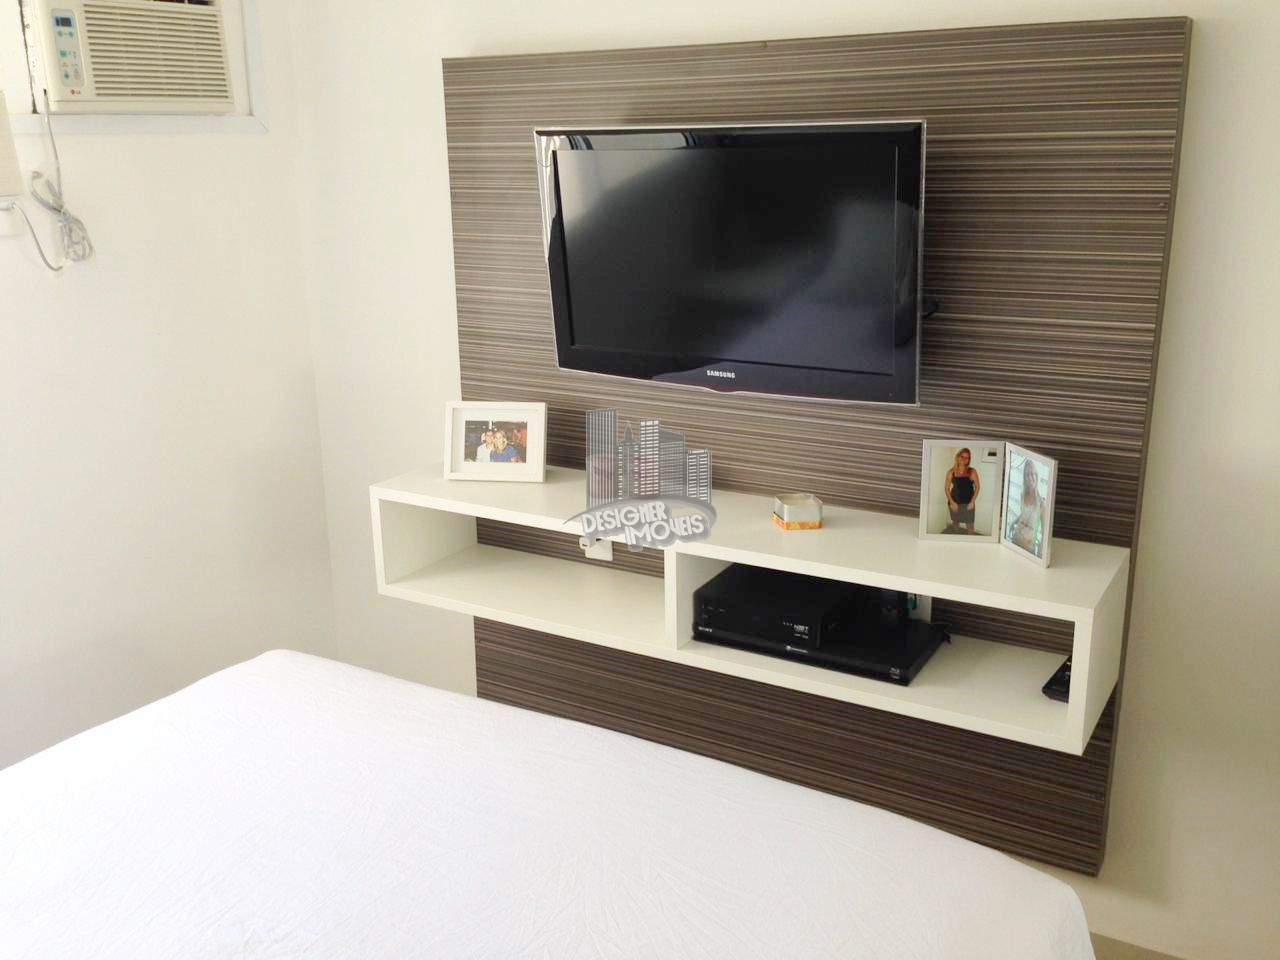 Apartamento Para Alugar no Condomínio Península Way - Rio de Janeiro - RJ - Barra da Tijuca - LRA02006 - 12